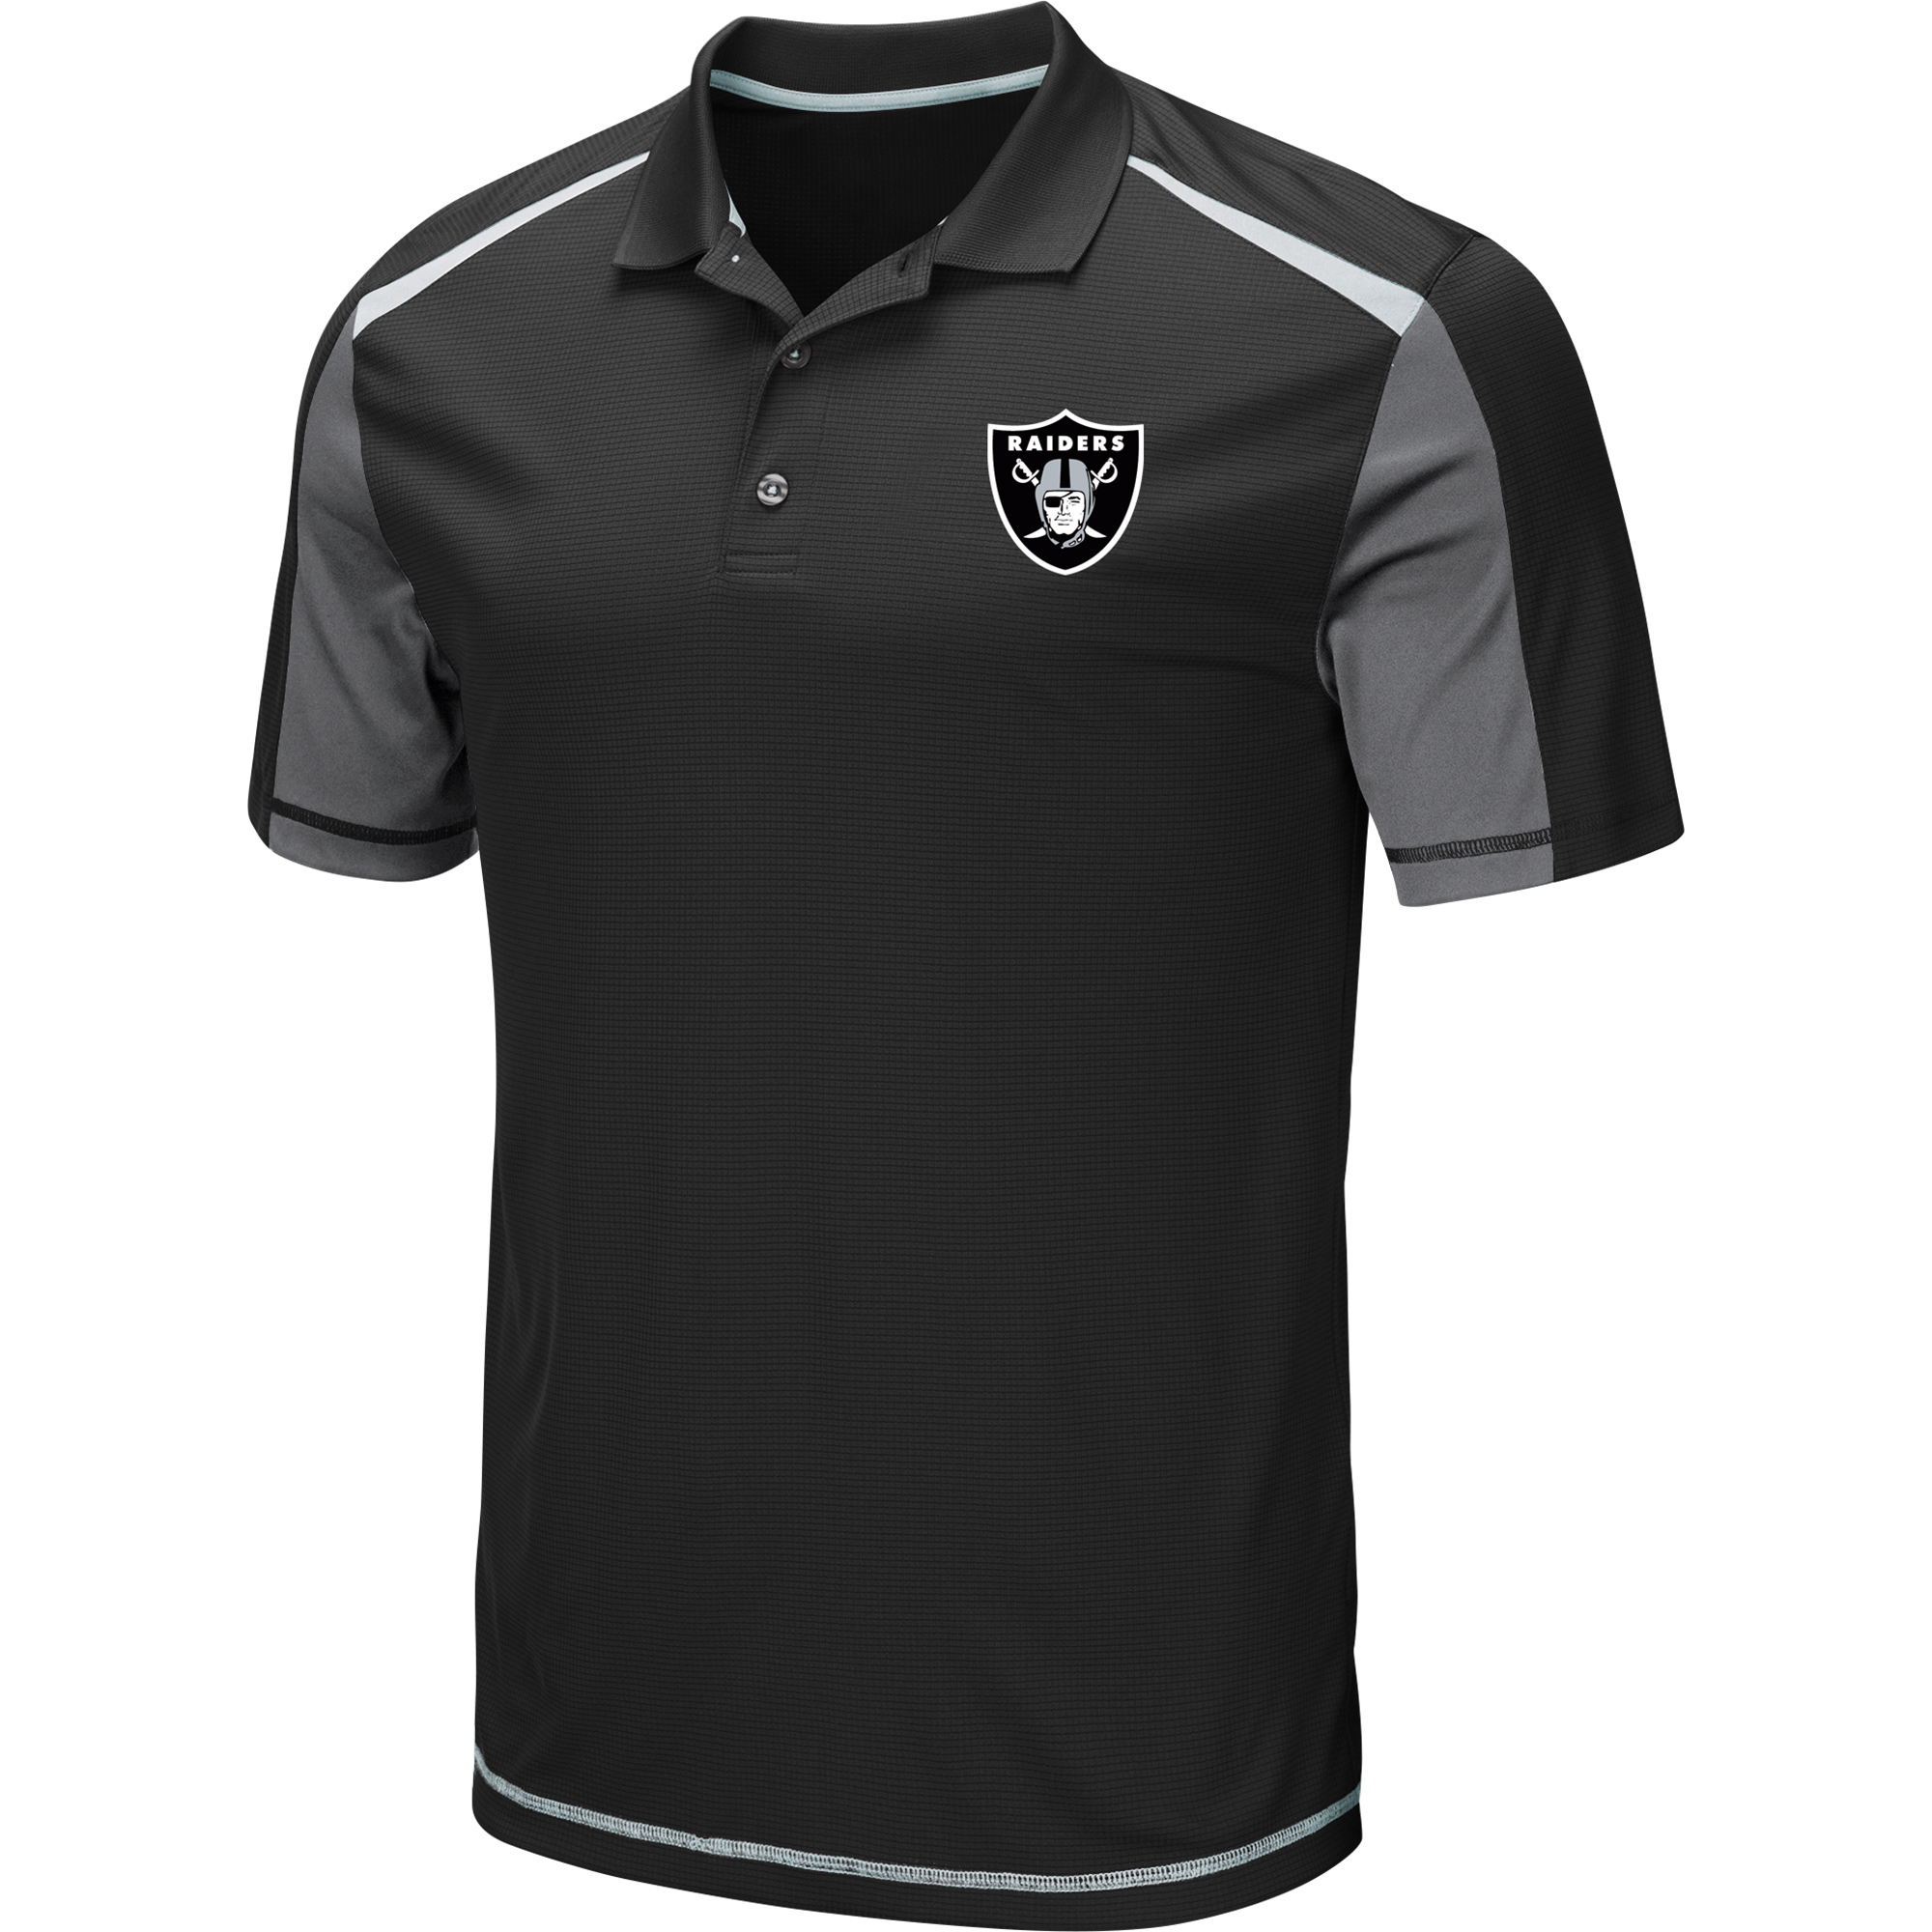 Men's Black Oakland Raiders Draft Prize Polo